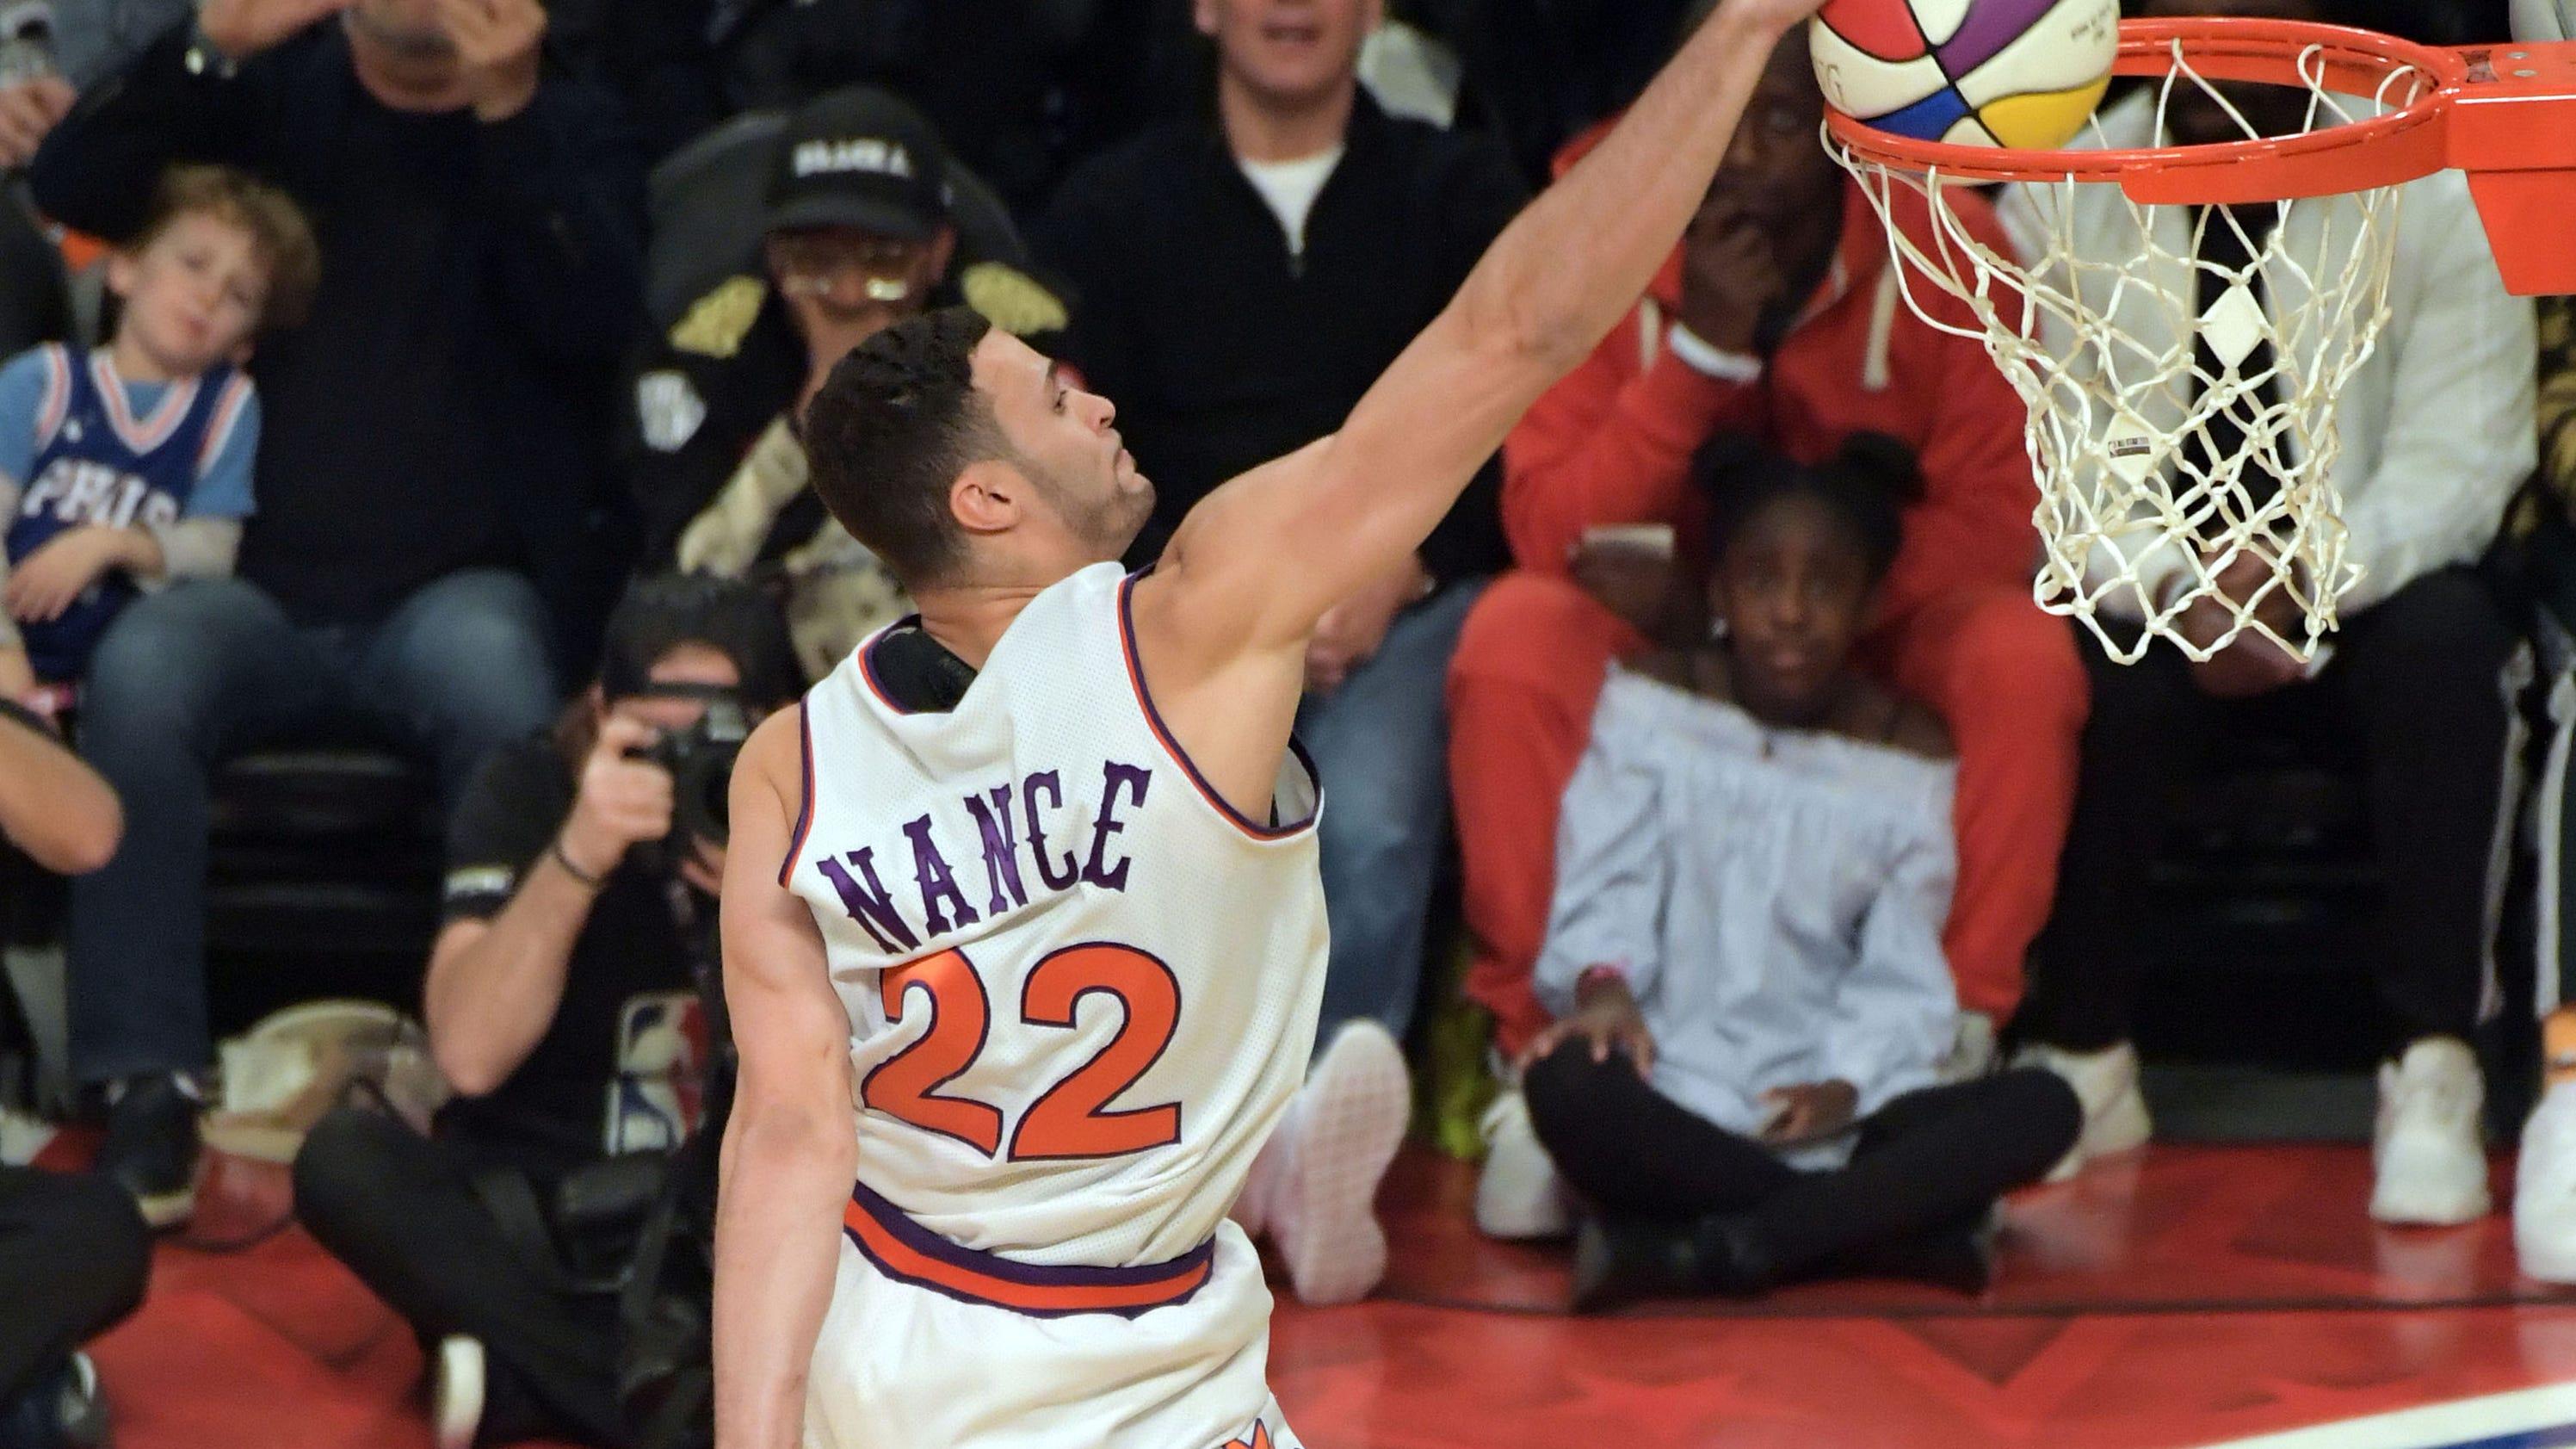 Larry-nance-jr-dunk